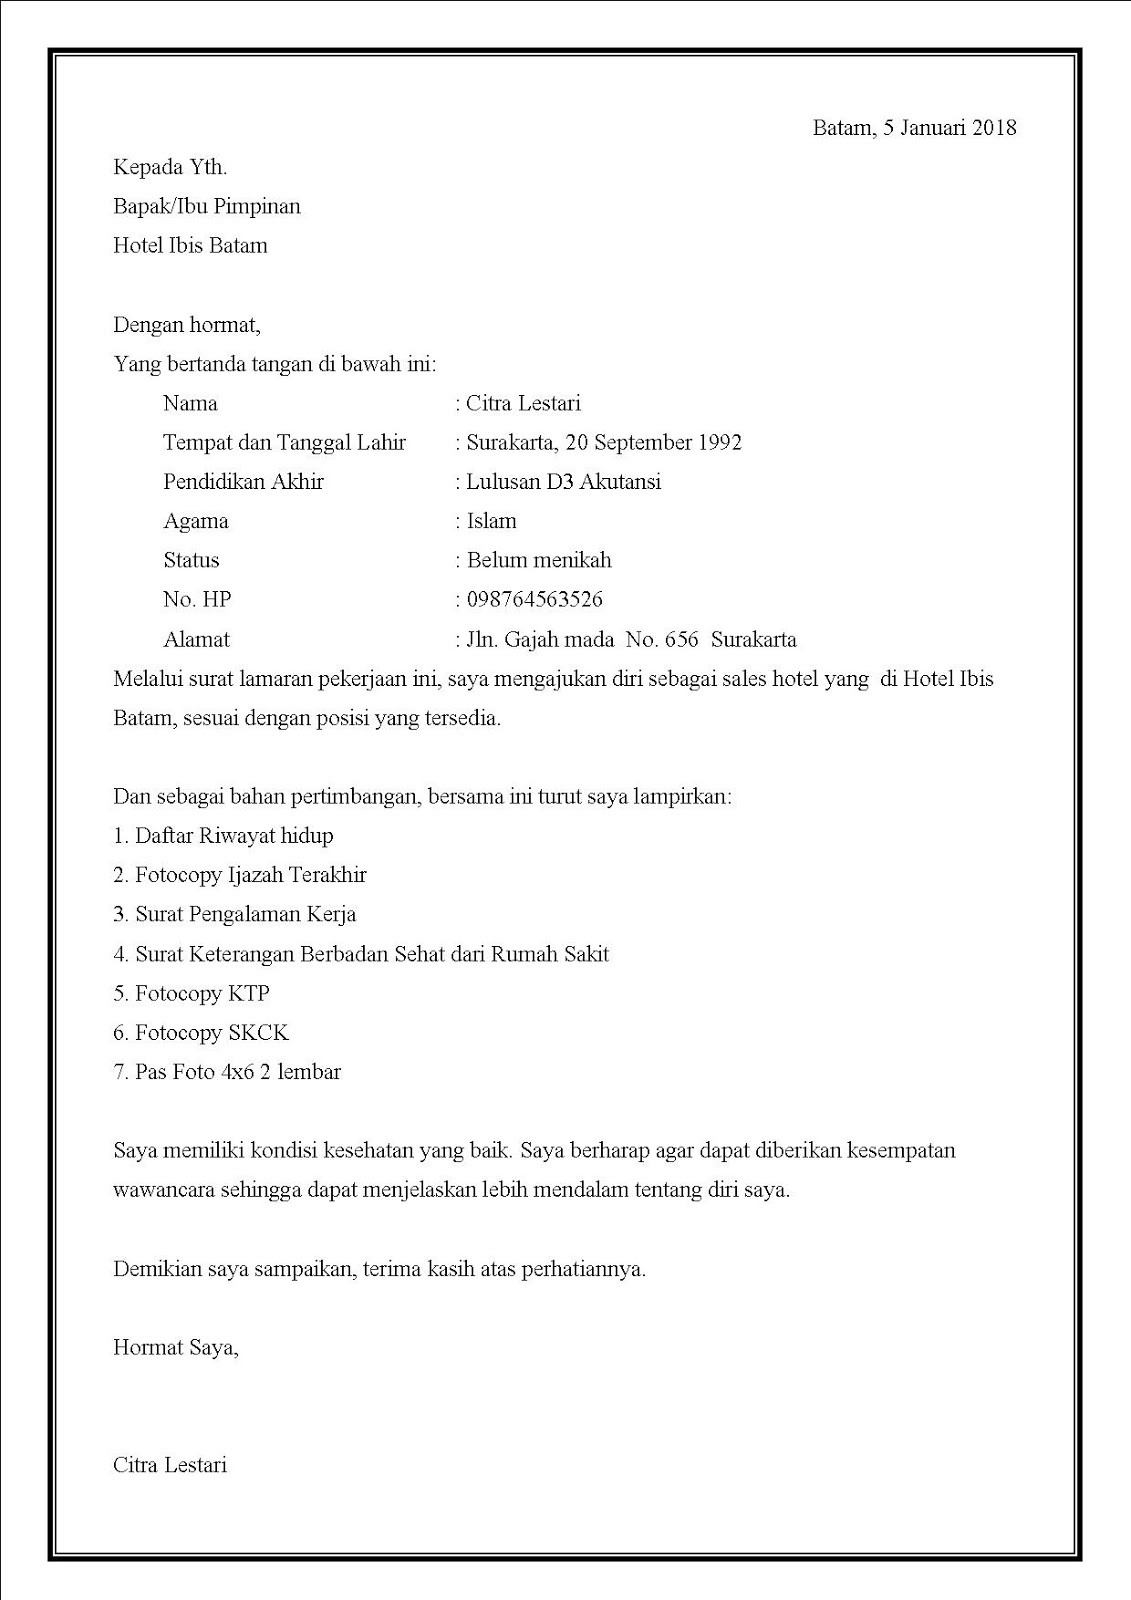 Contoh surat lamaran kerja di hotel untuk sales hotel dalam bahasa indonesia